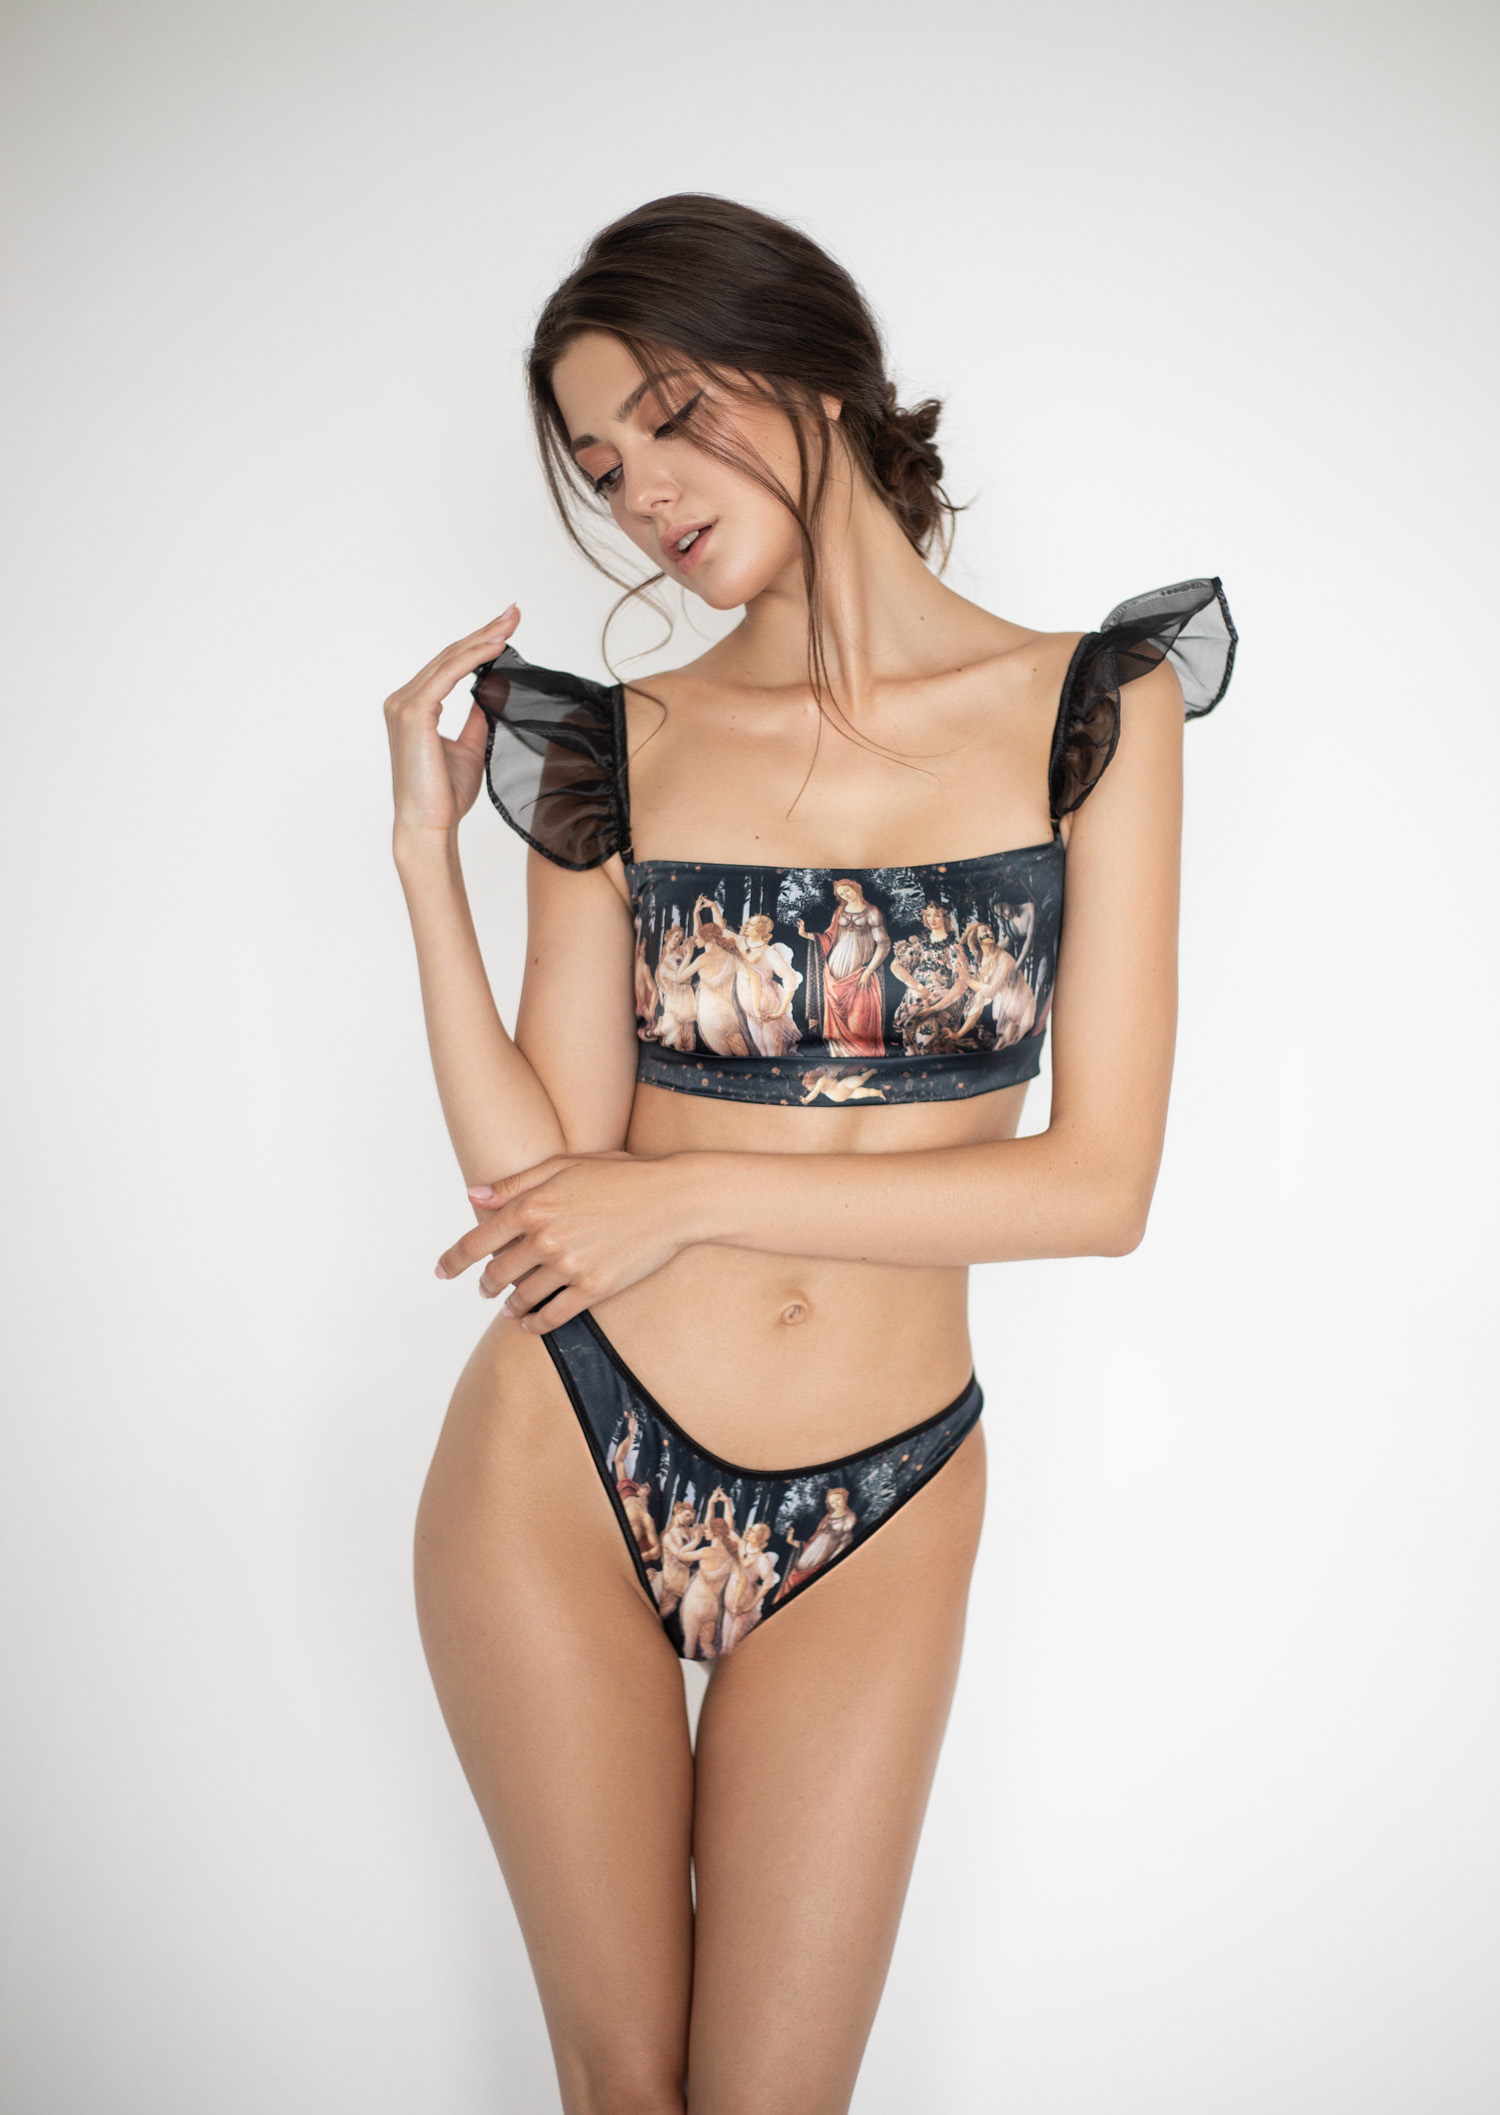 Primavera printed lingerie set / clear panties with underwired bra / historic renaissance underwear / transparent erotic lingerie set